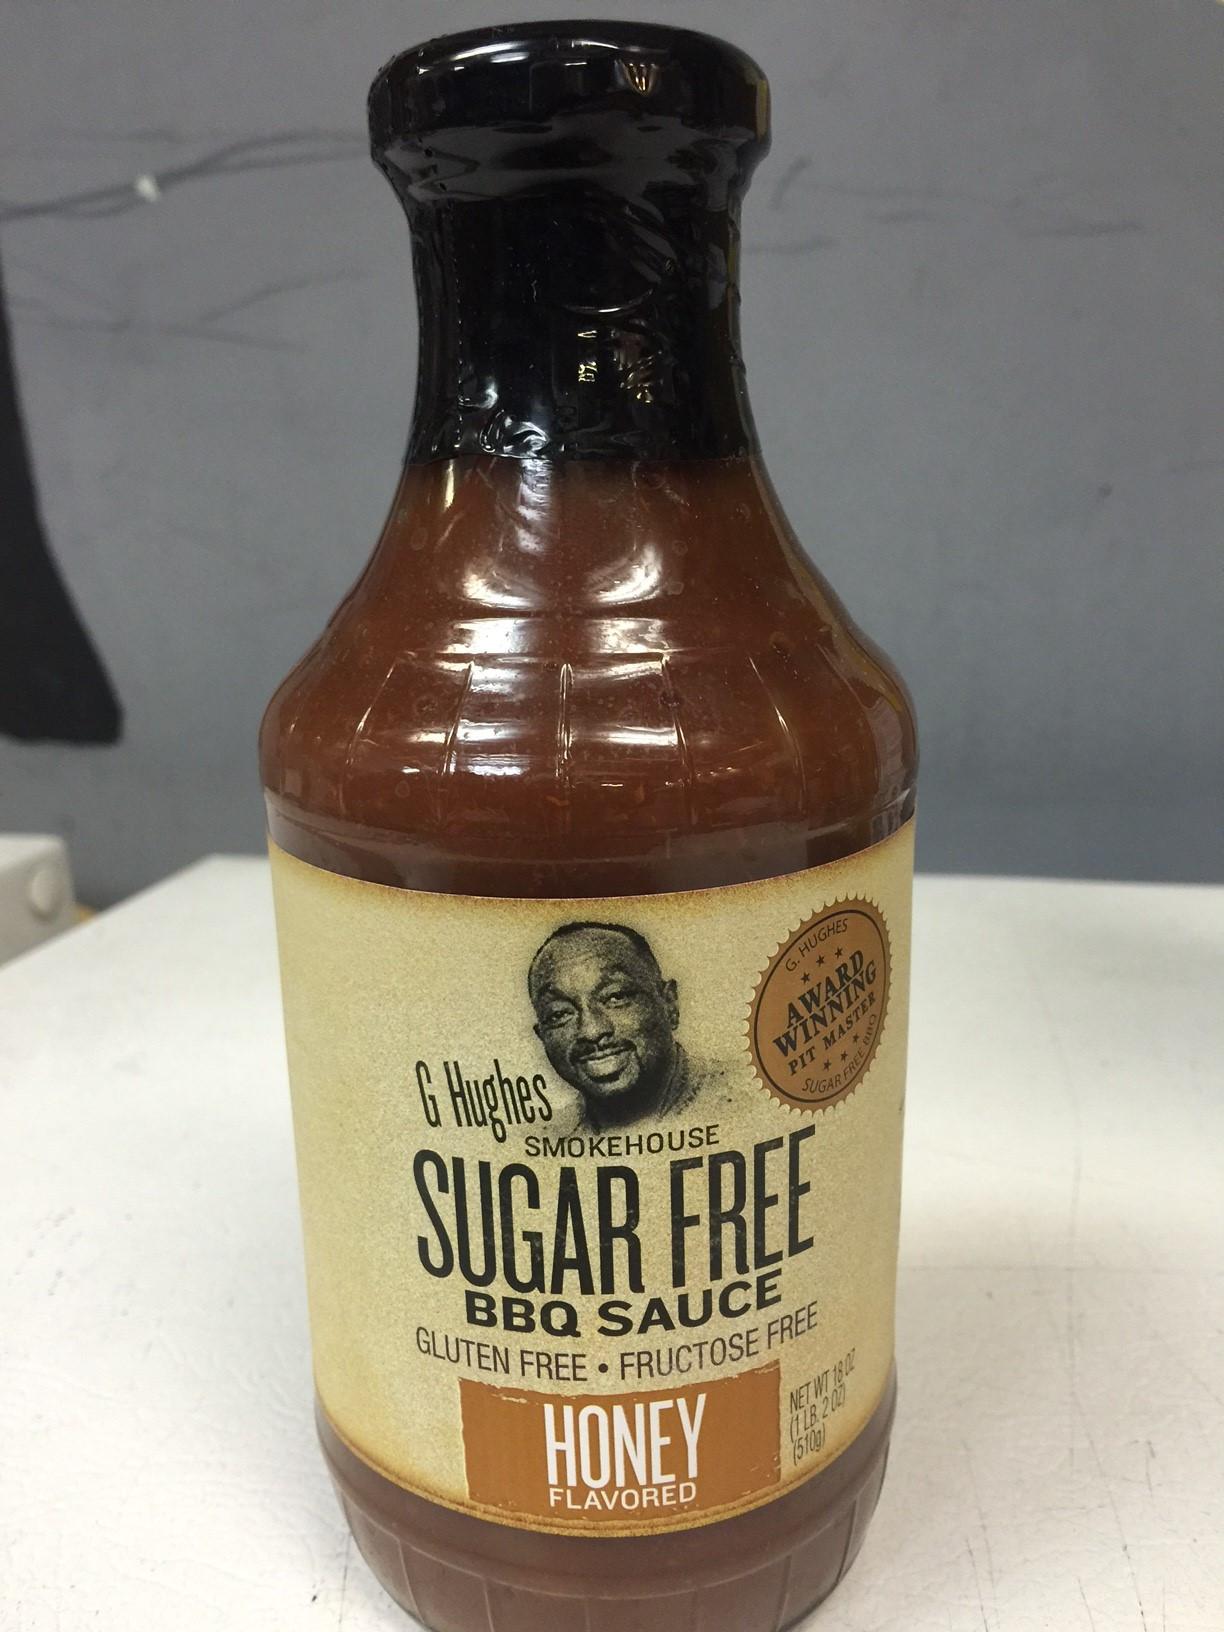 G Hughes Sugar Free Bbq Sauce  G Hughes Sugar Free Honey Flavored BBQ Sauce – Lo Carb U